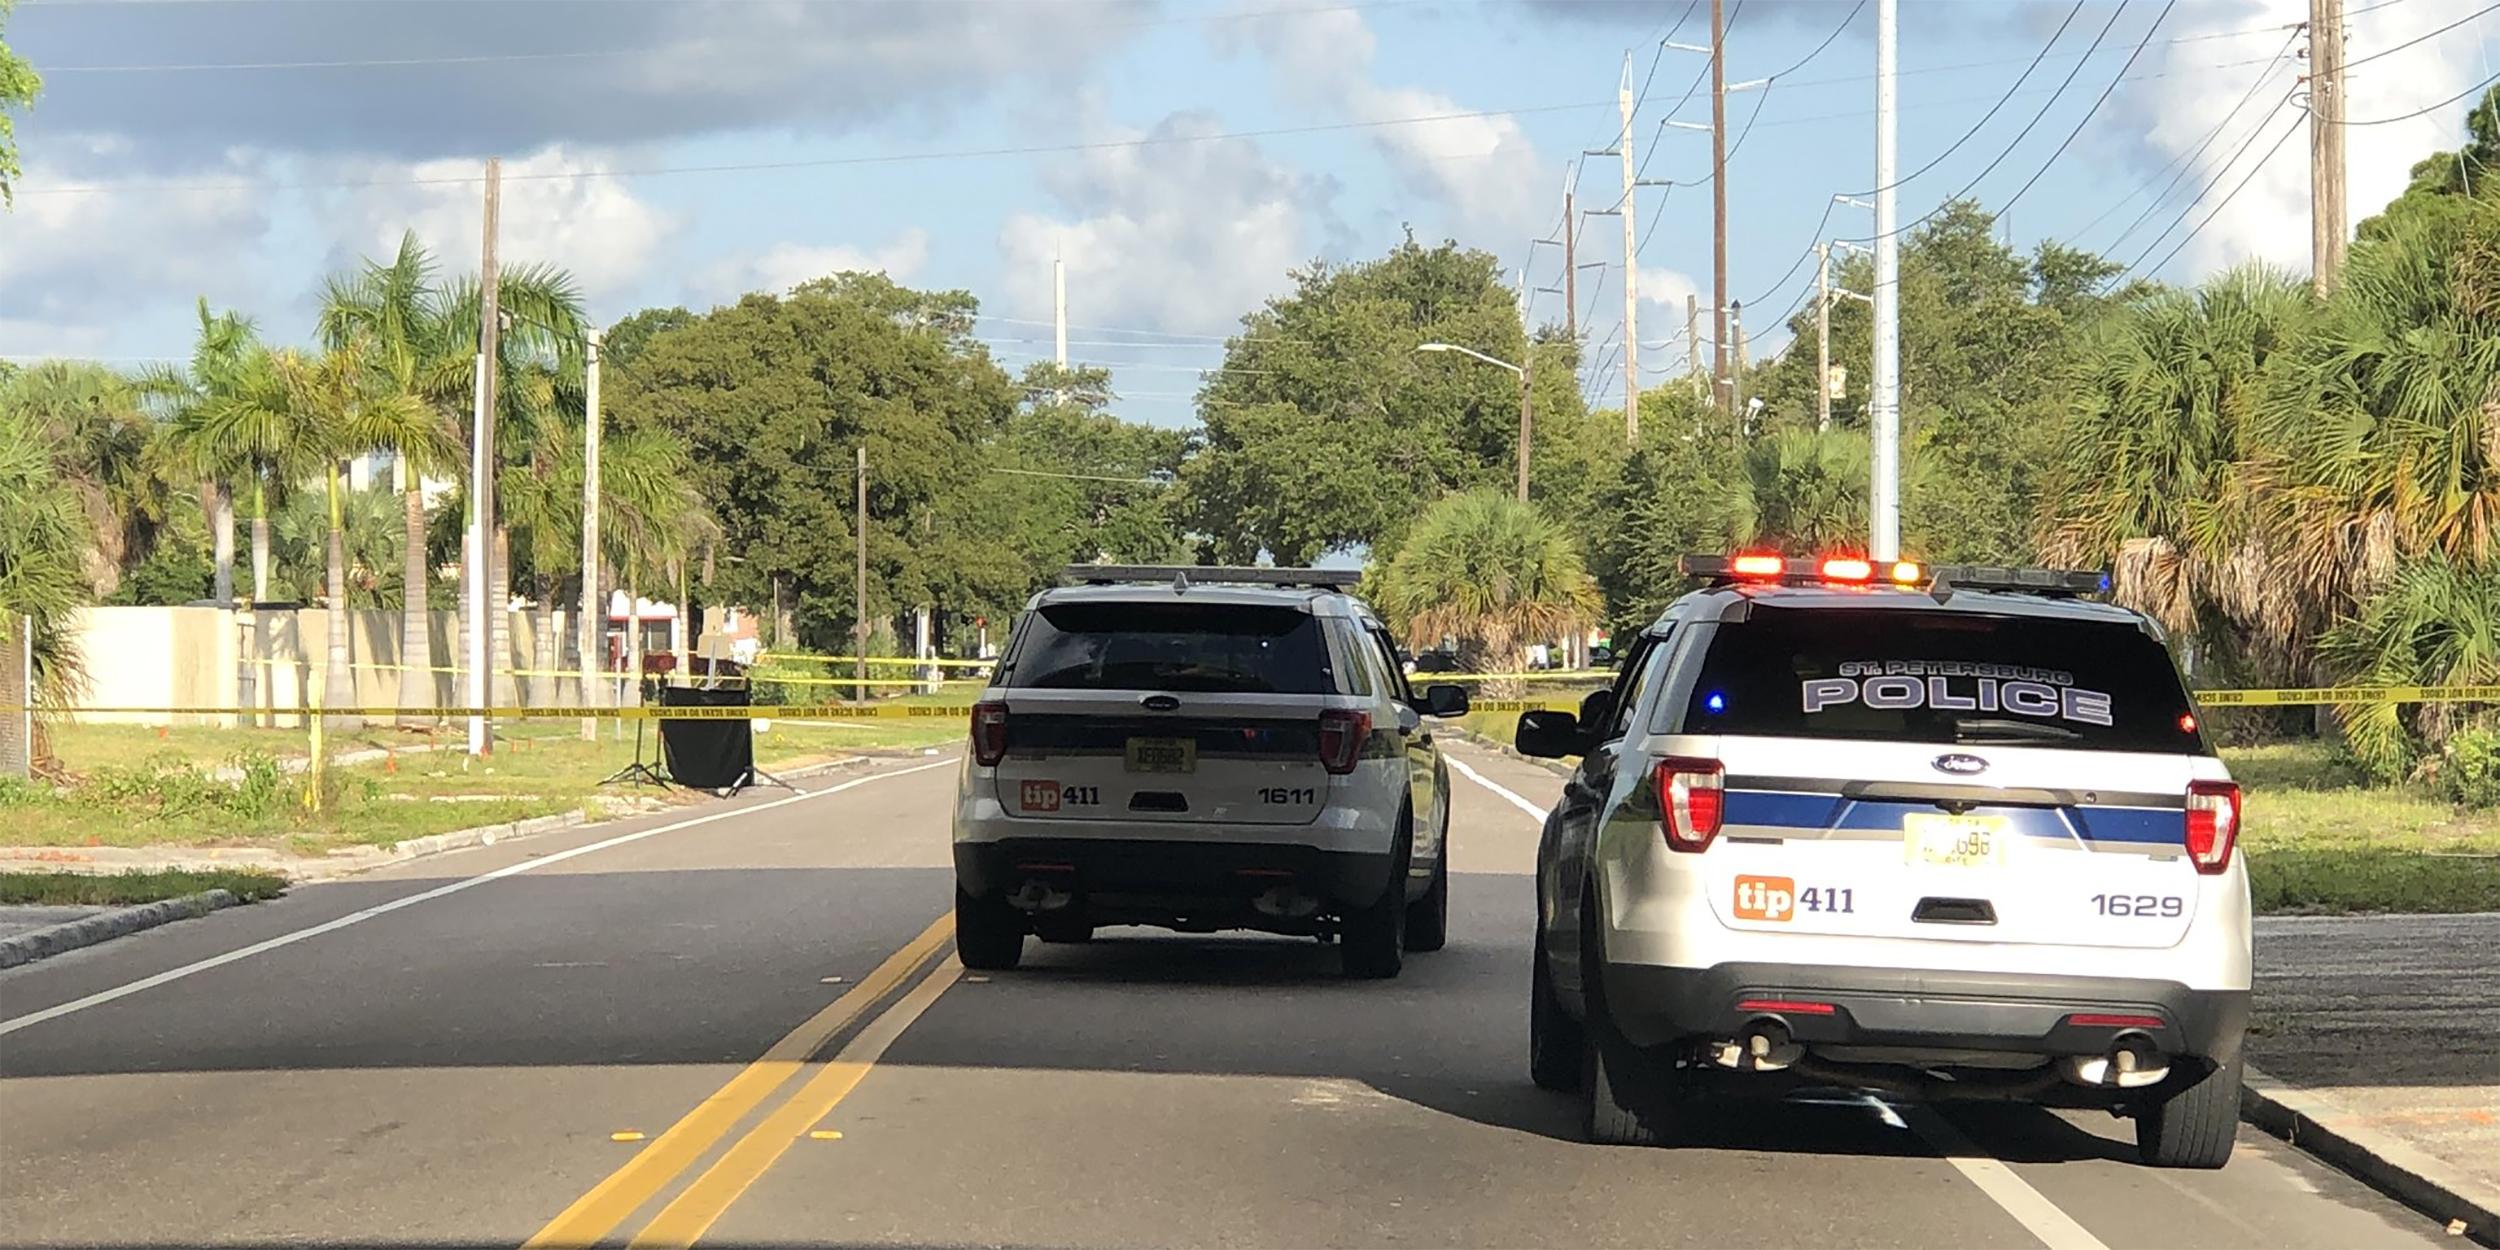 Florida jogger finds human head during morning run, police say